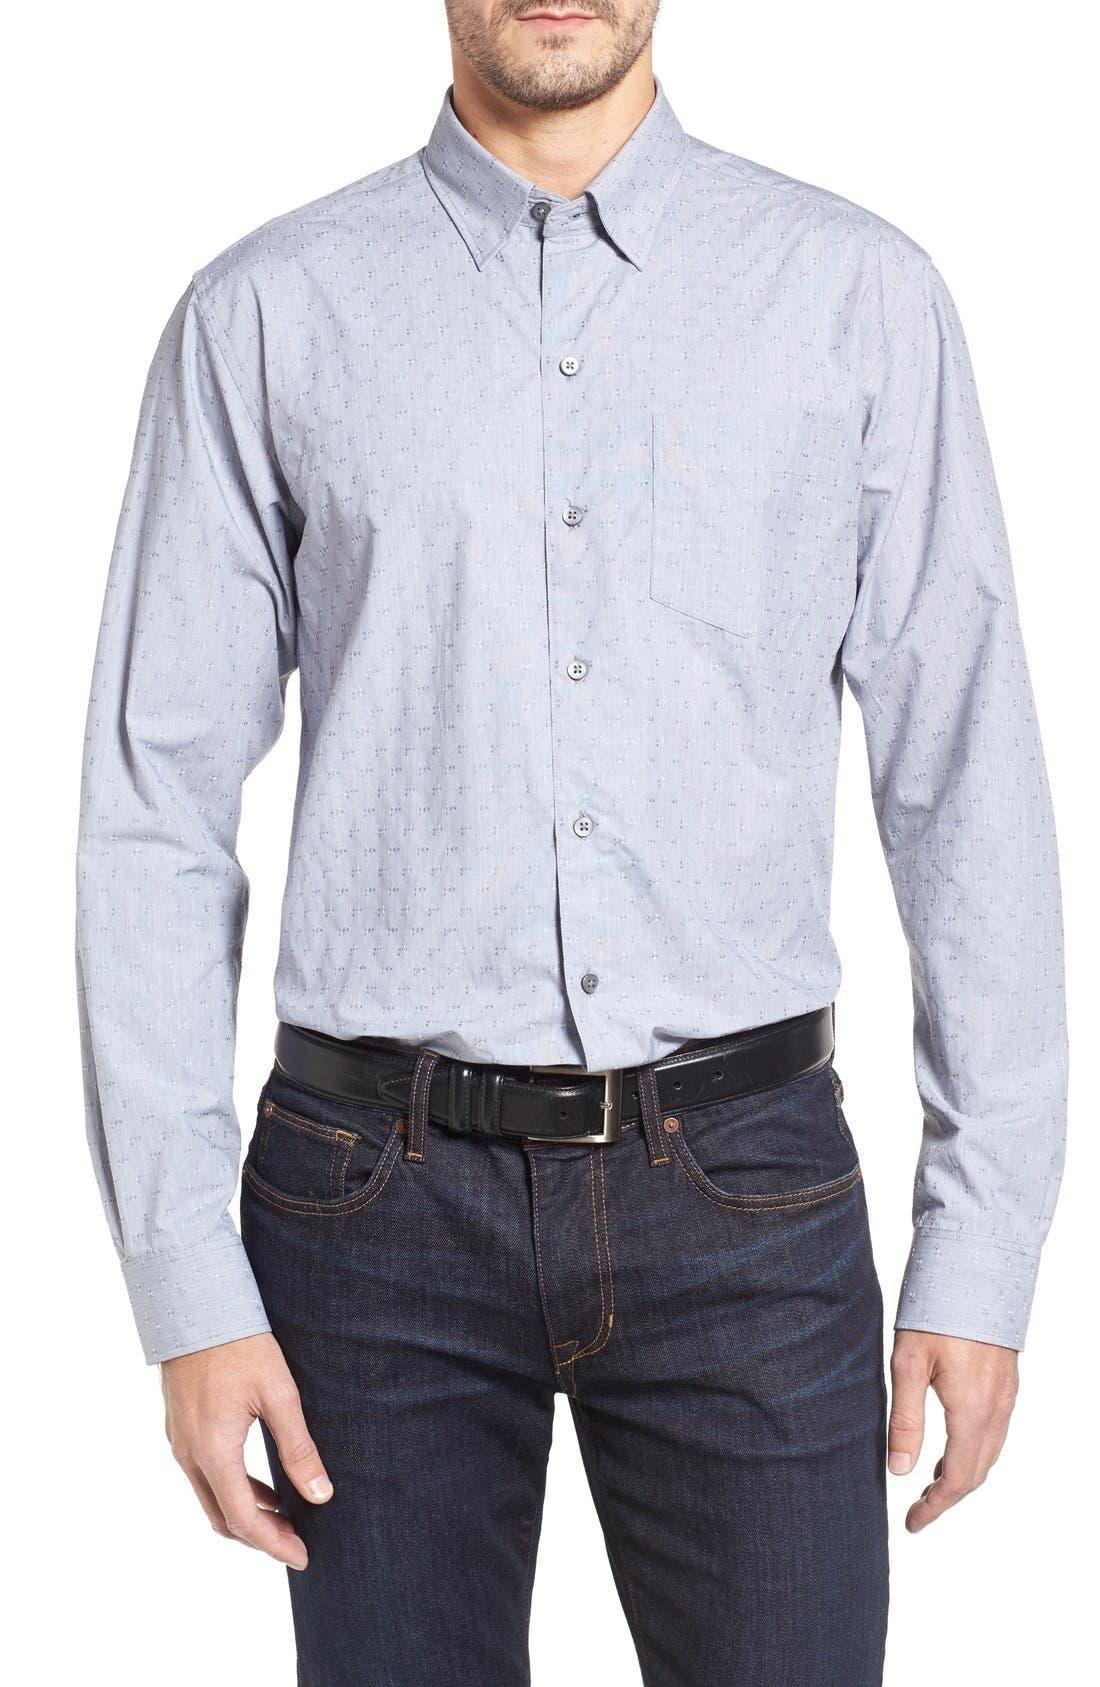 Cutter & Buck Starboard Jacquard Sport Shirt (Big & Tall)